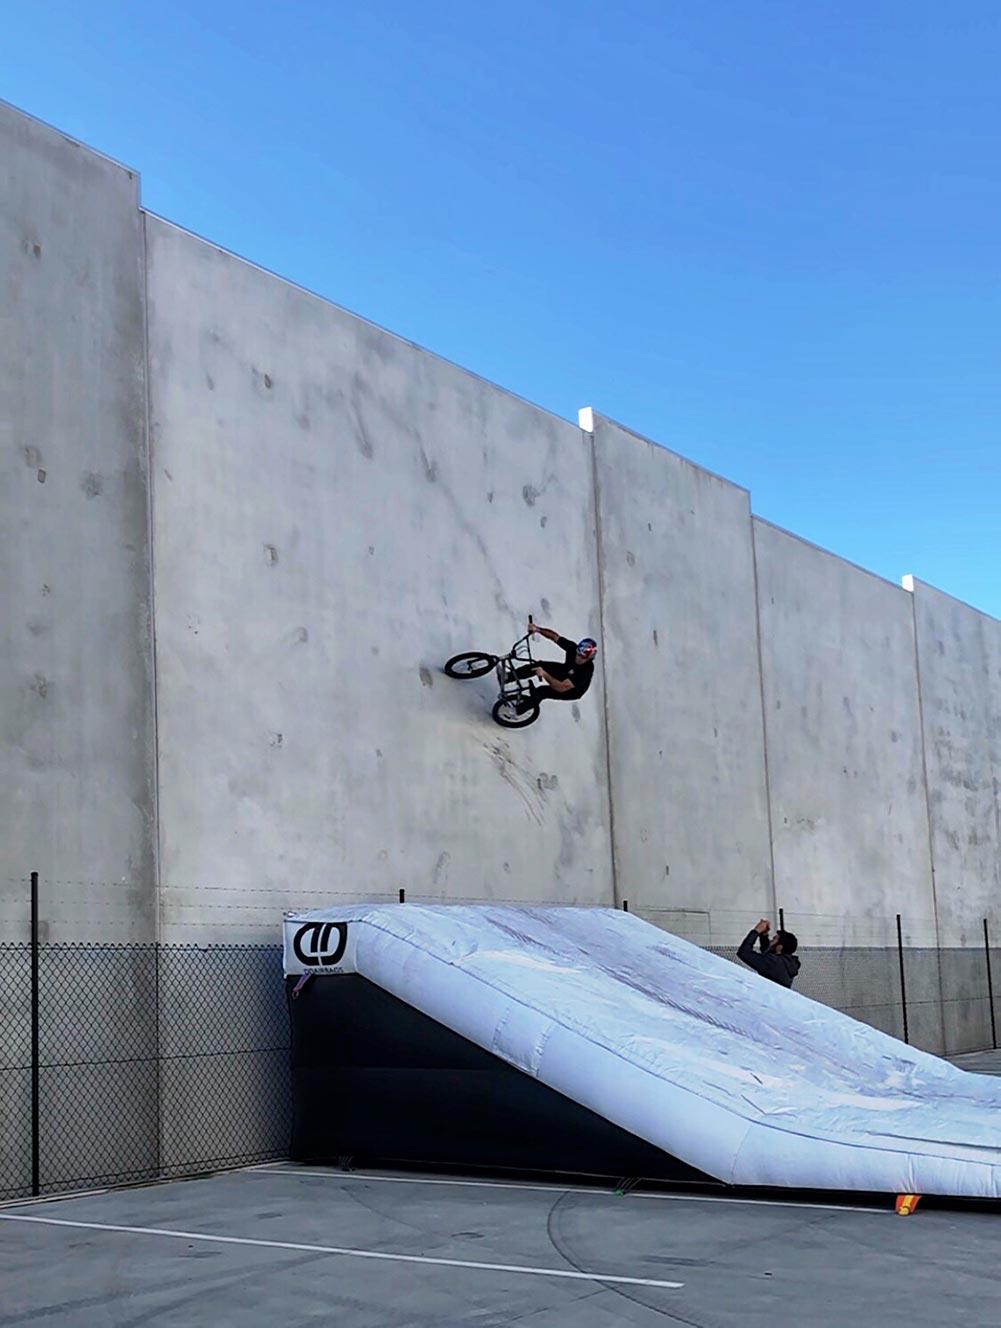 ddairbags-bmx-lander-wall-ride-02.jpg